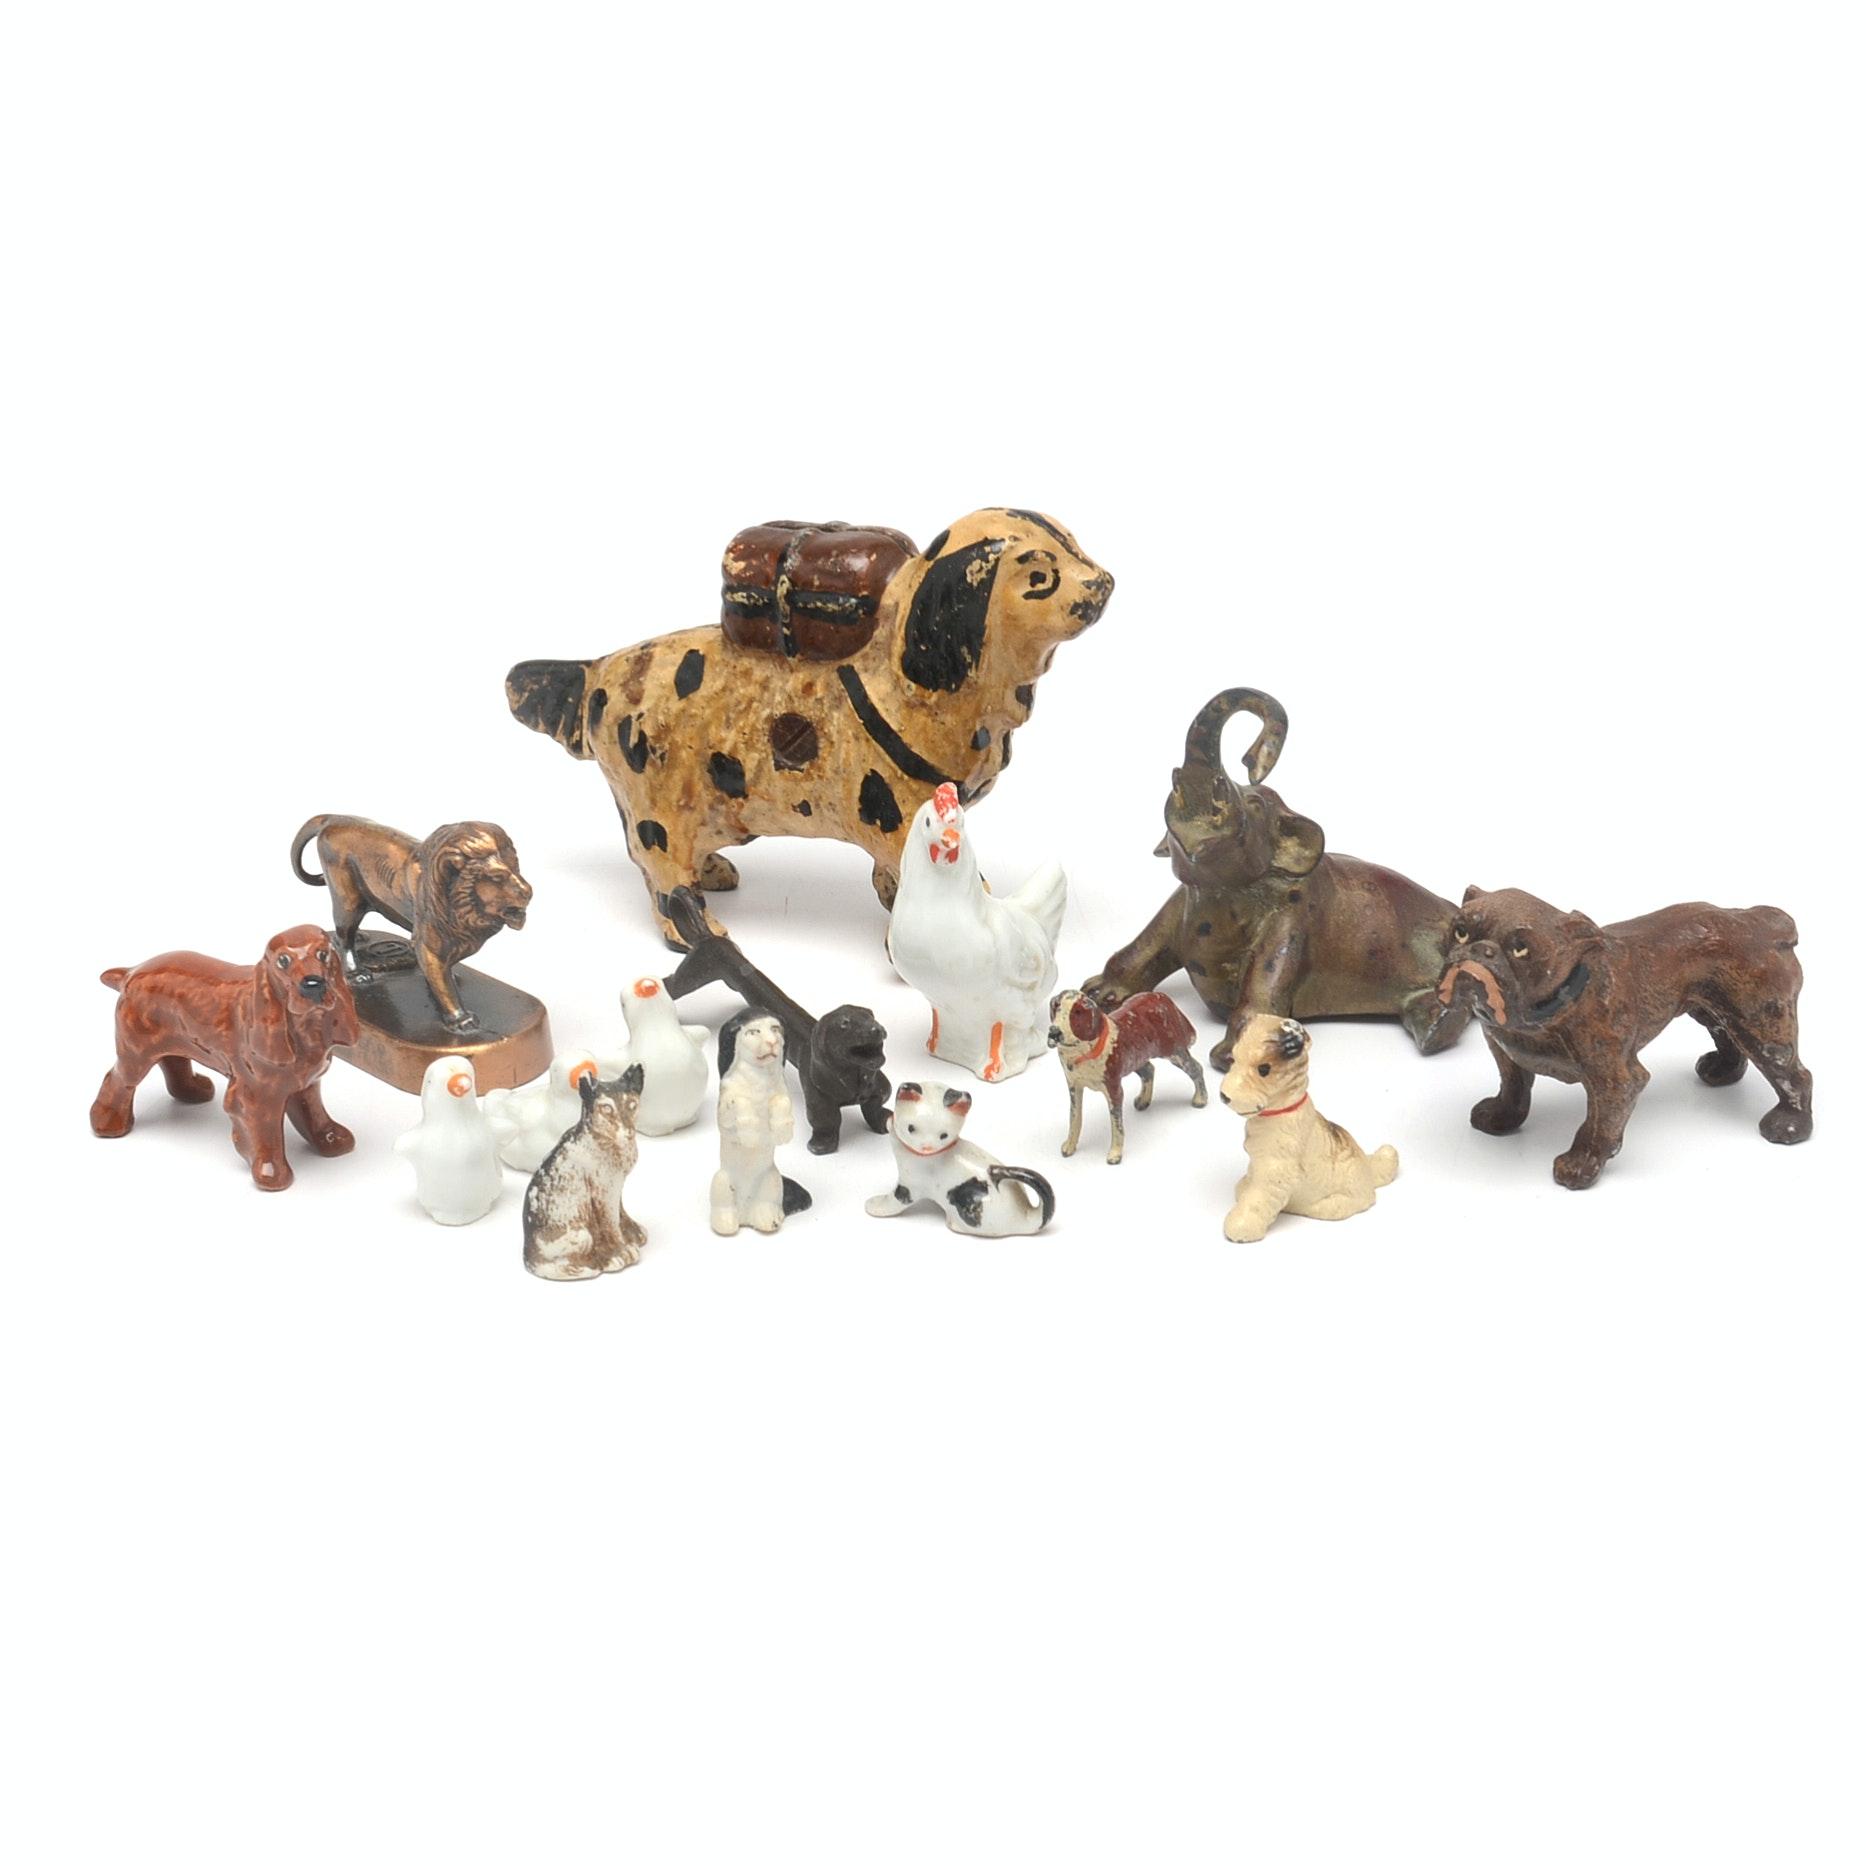 Vintage AC Williams Cast Iron Newfoundland Dog Bank and Figurines